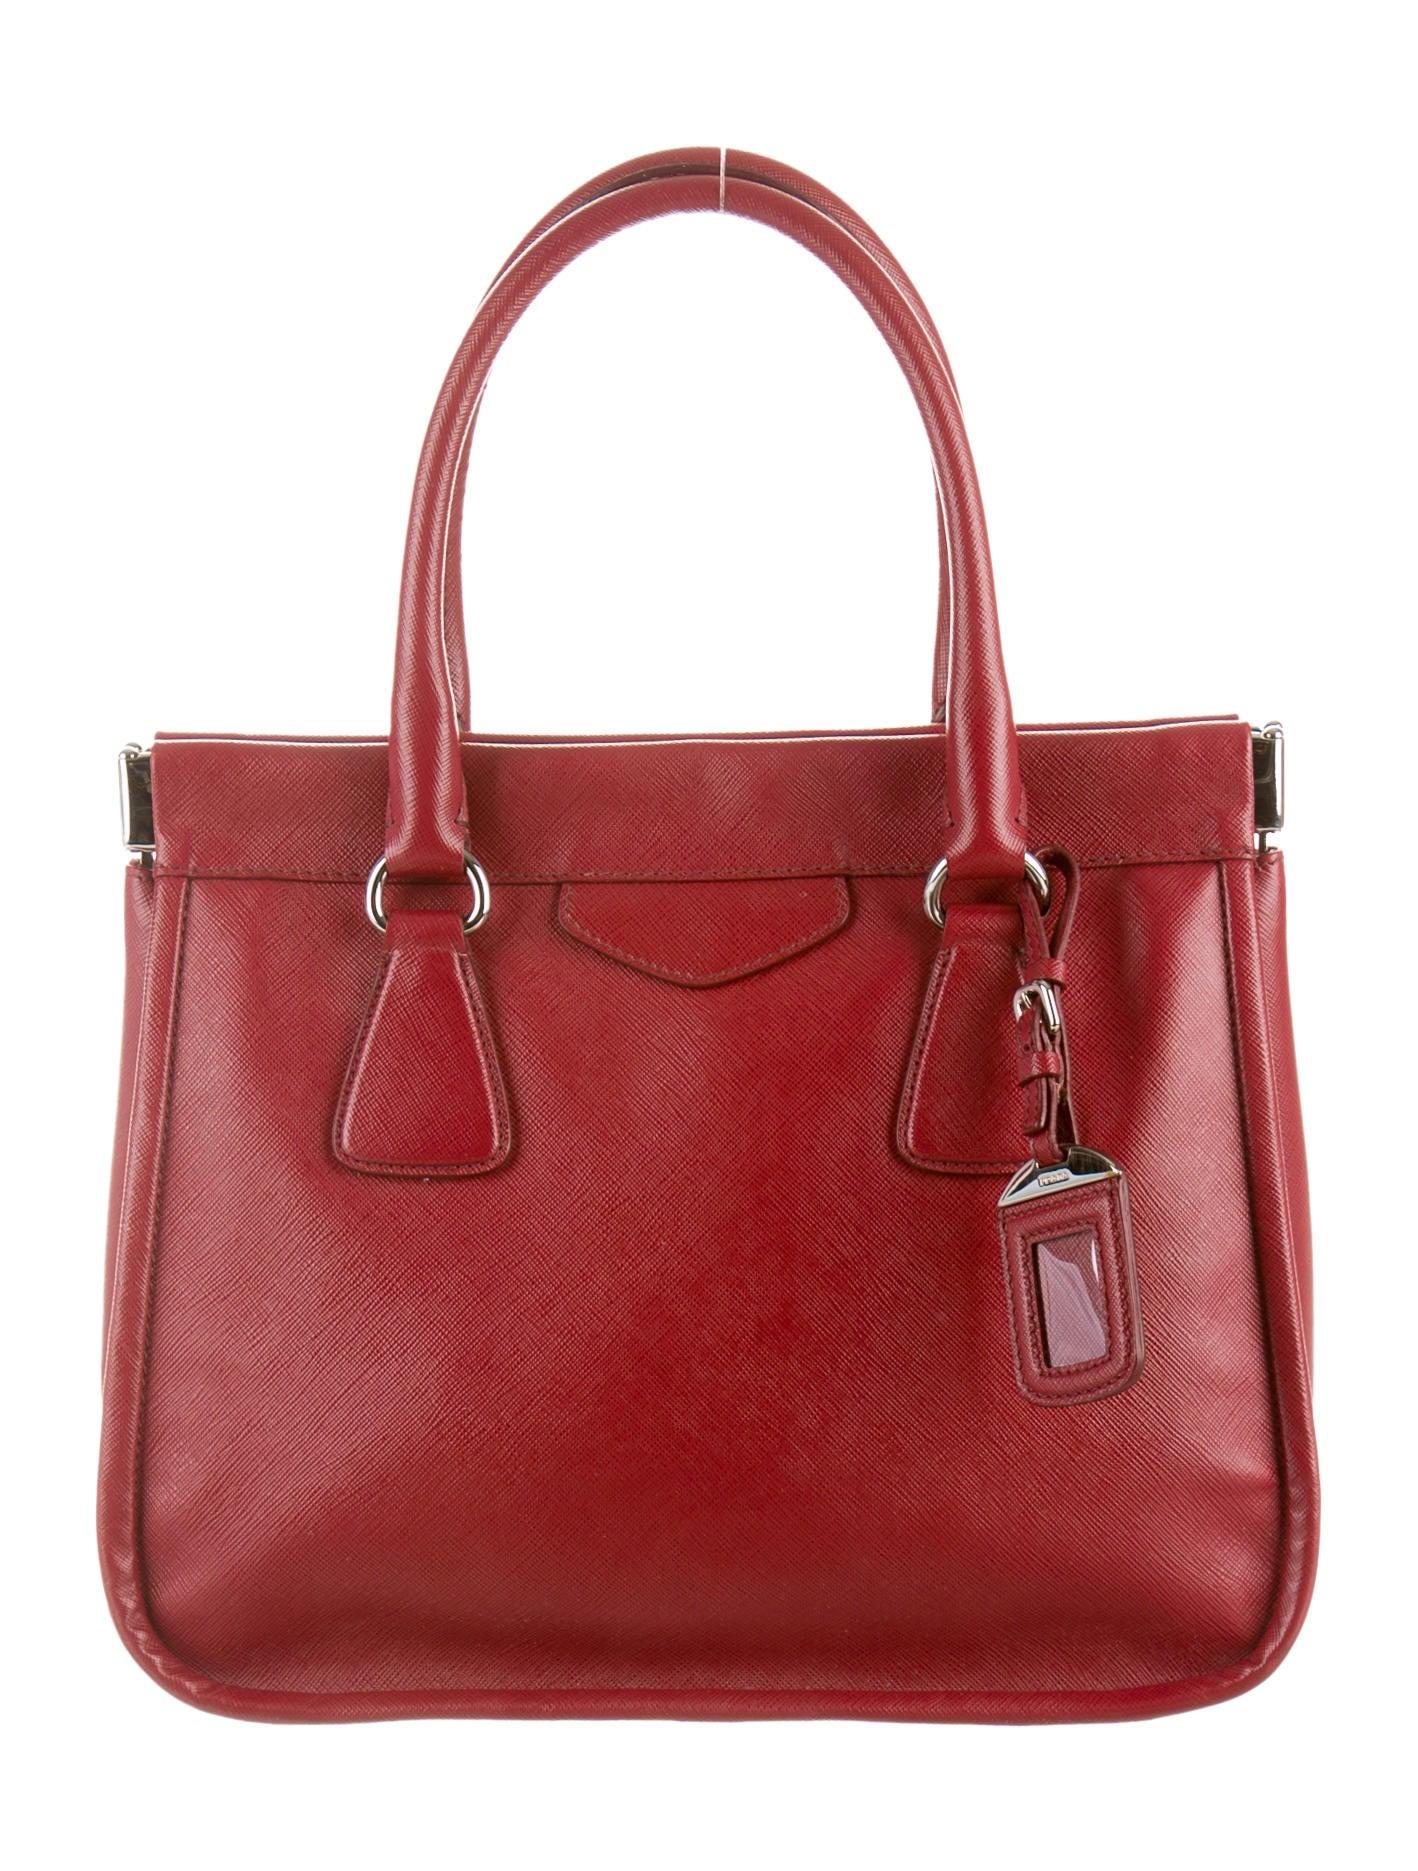 prada saffiano tote handbags pra70561 the realreal